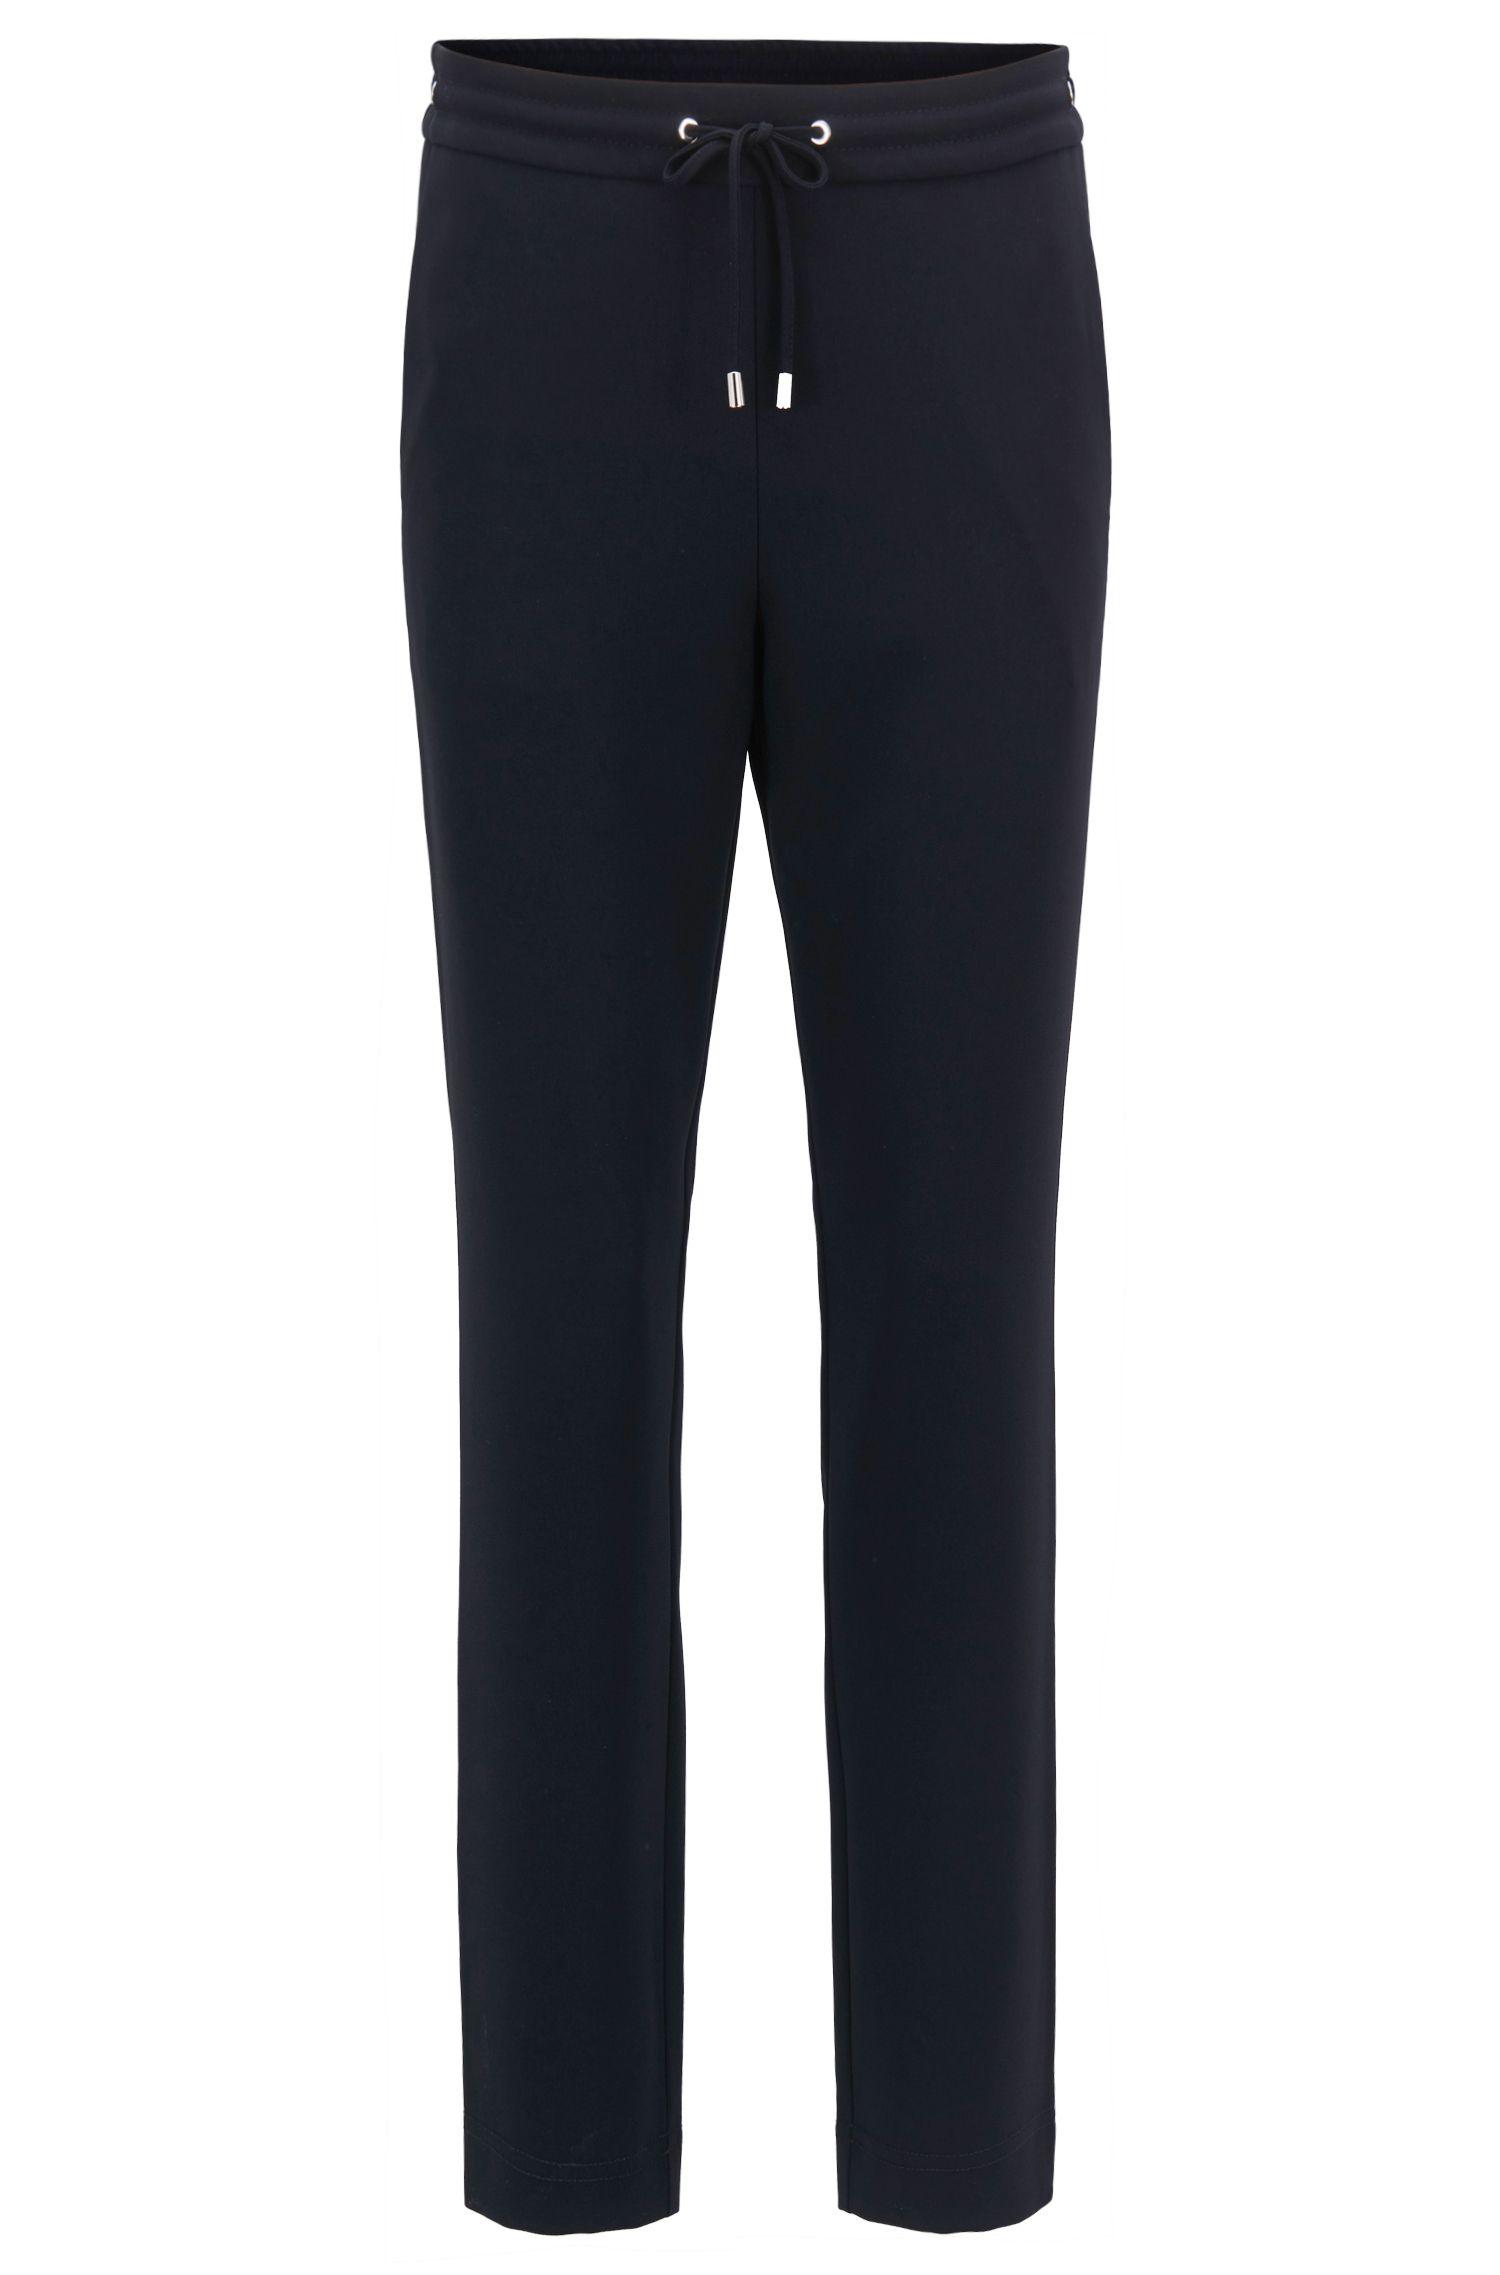 Pantalon raccourci style athleisure en crêpe technique